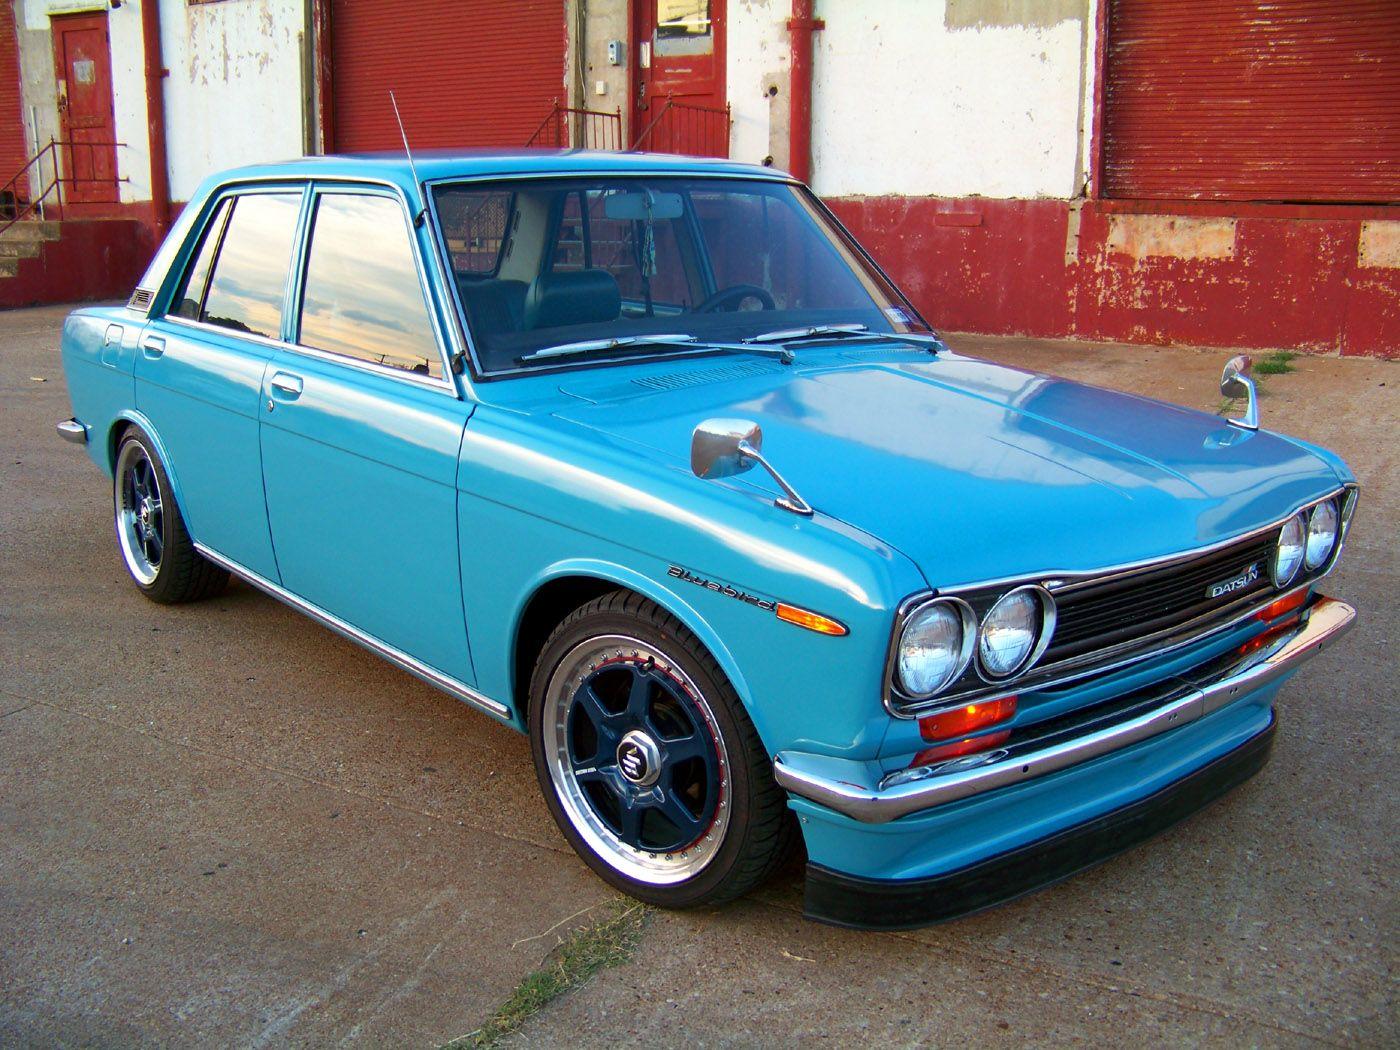 Datsun 510 sedan (1971